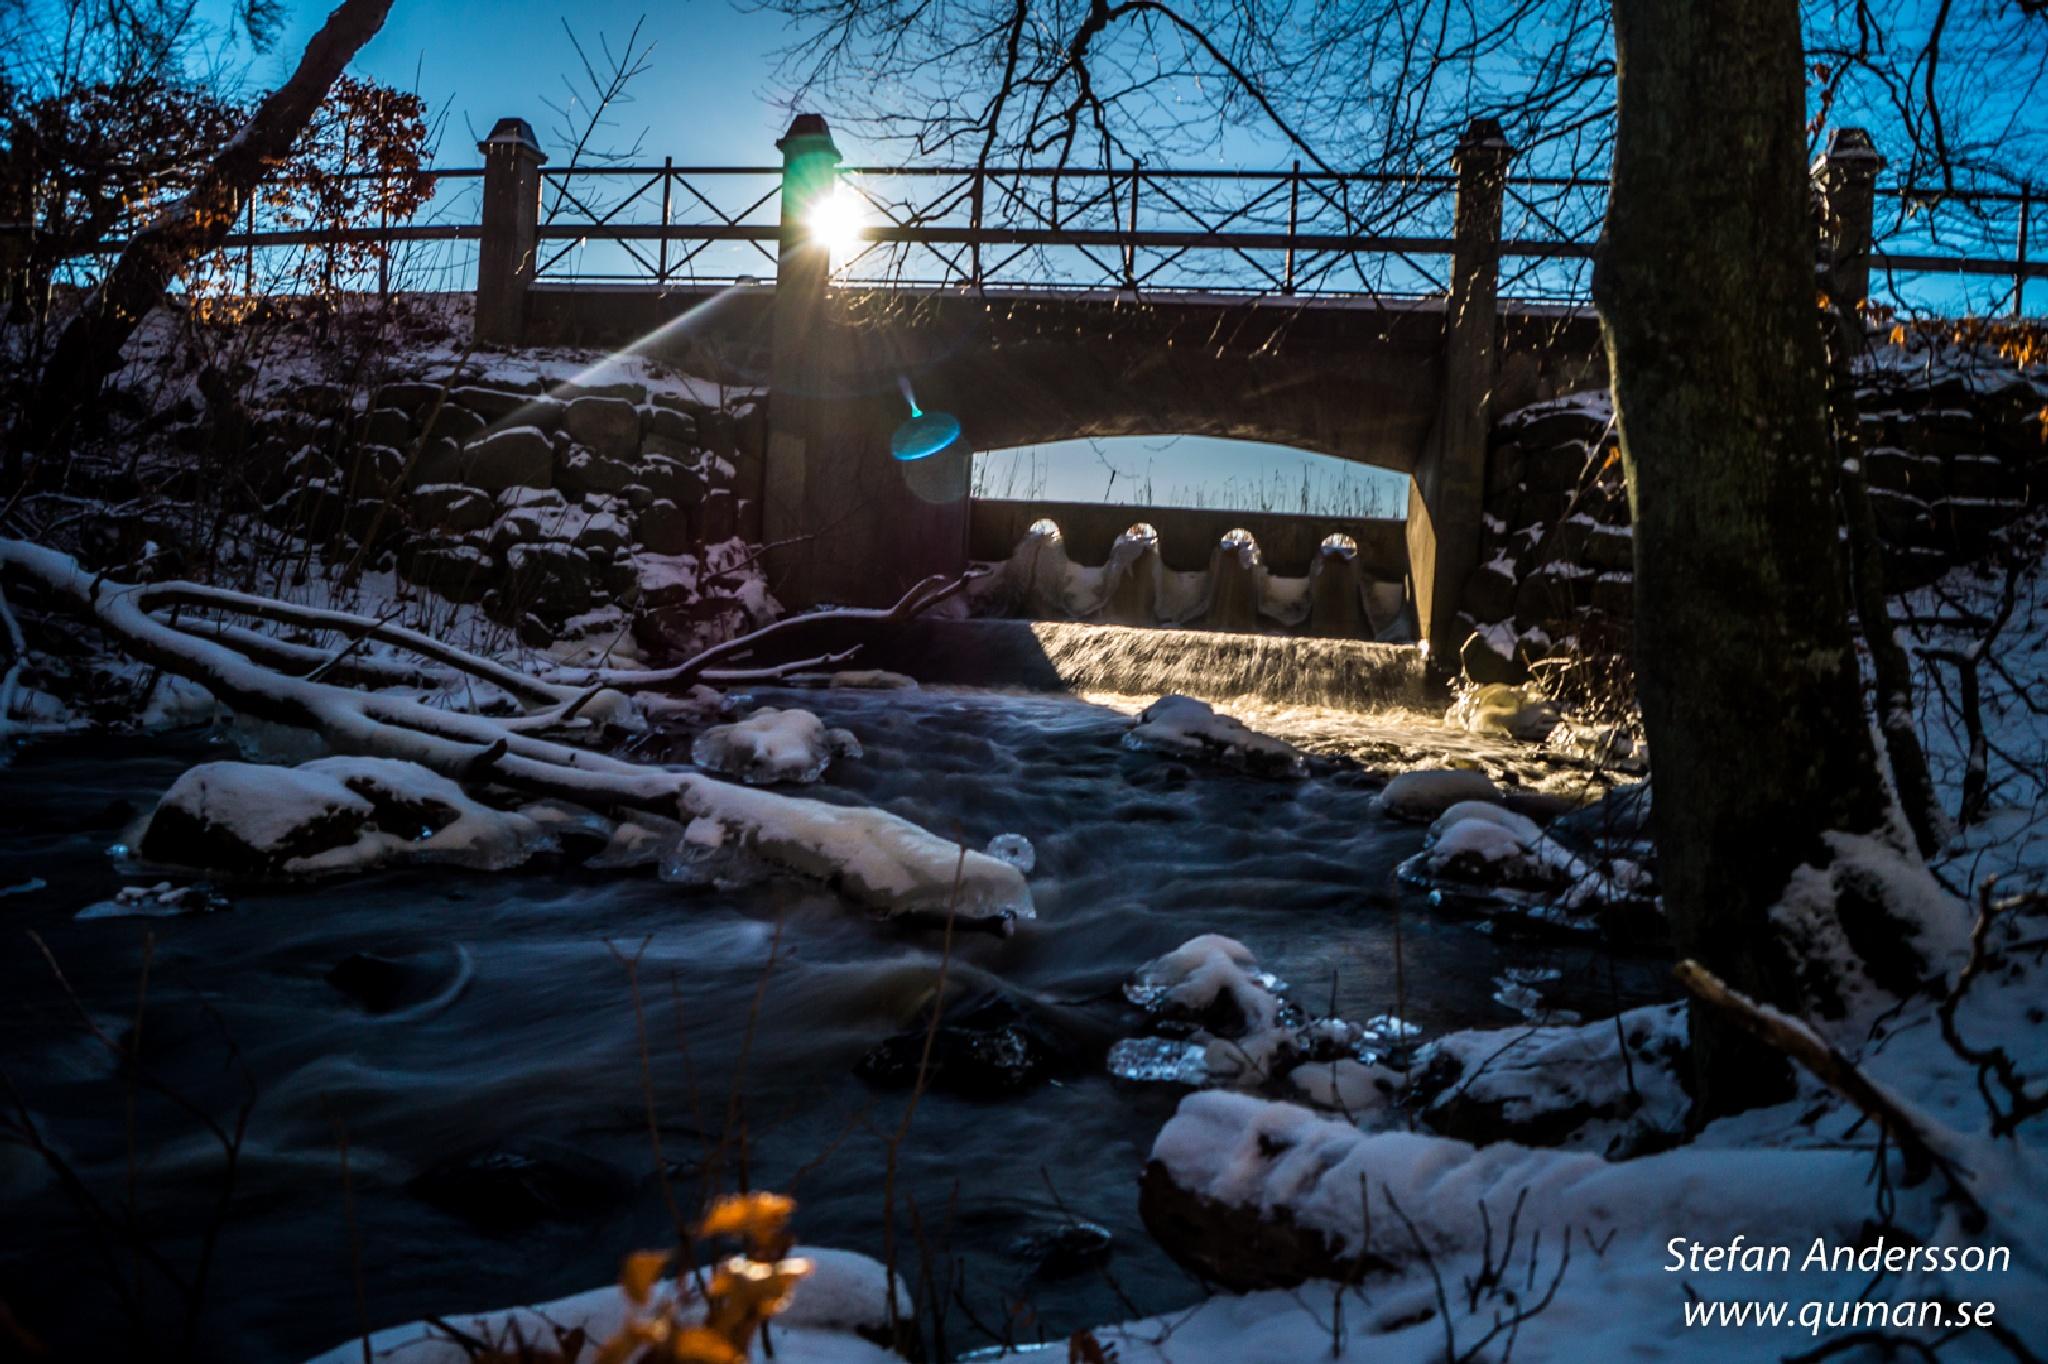 River in motion, Wintertime by Stefan Andersson